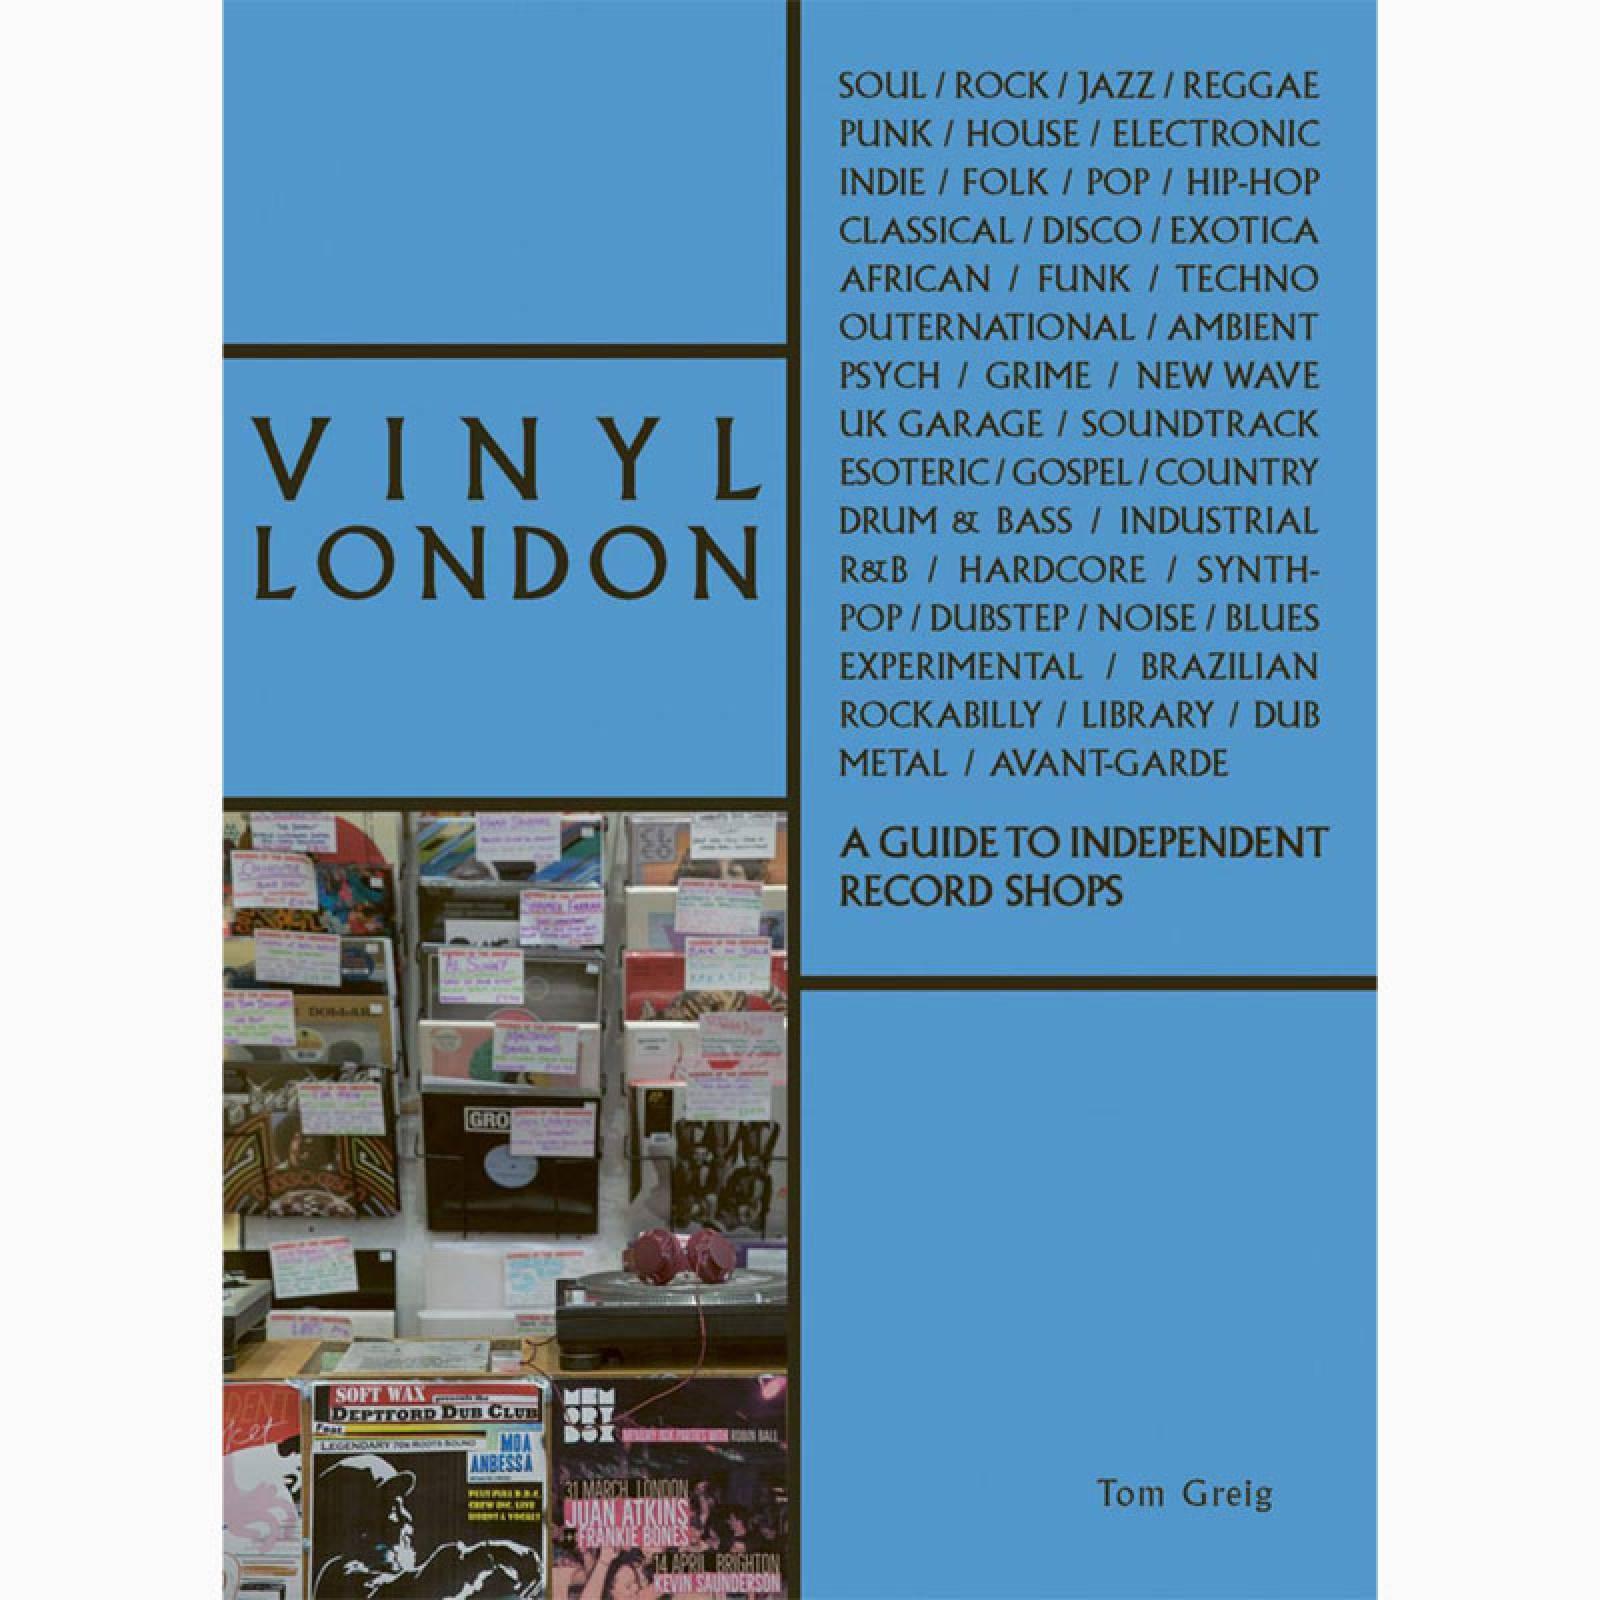 Vinyl London - Paperback Book